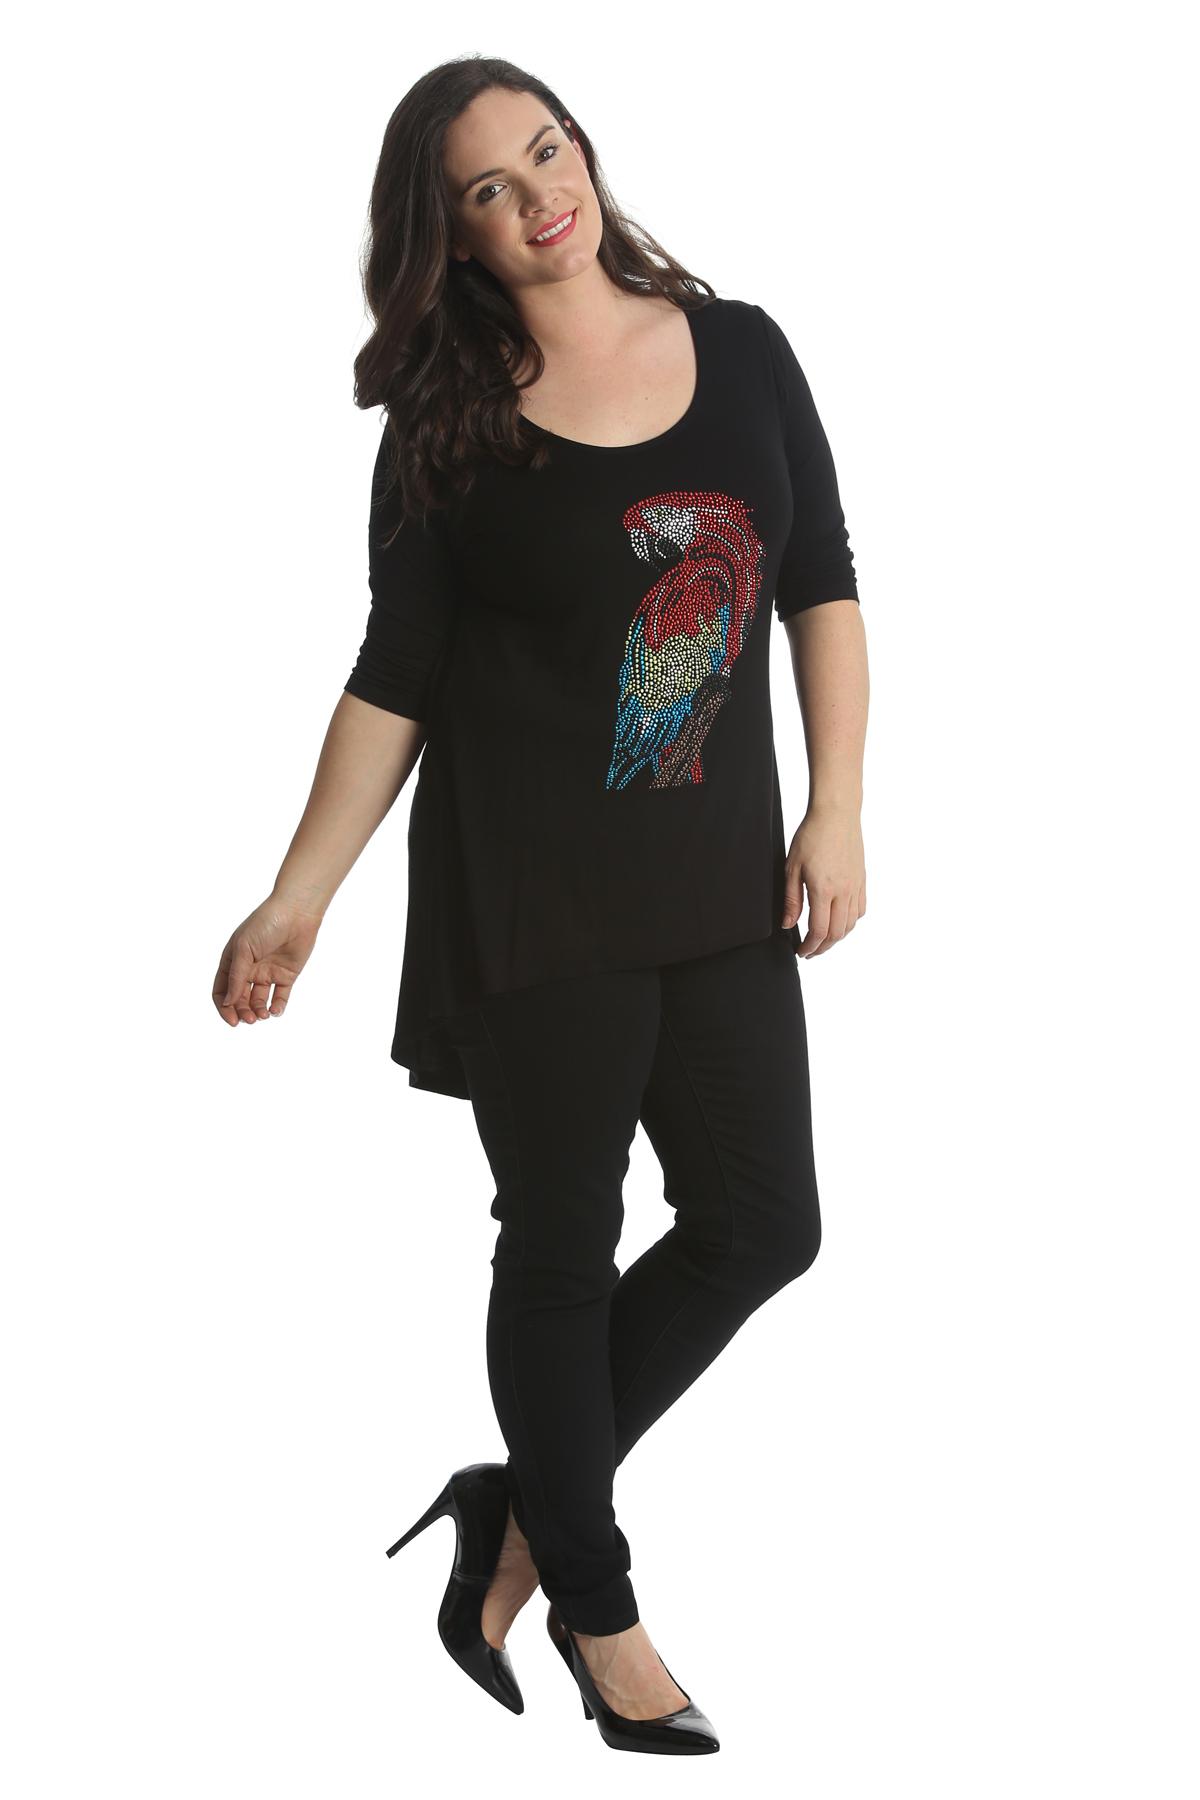 New Ladies Tops Womens Plus Size Parrot Rhinestones Bird Stud Shirt Nouvelle